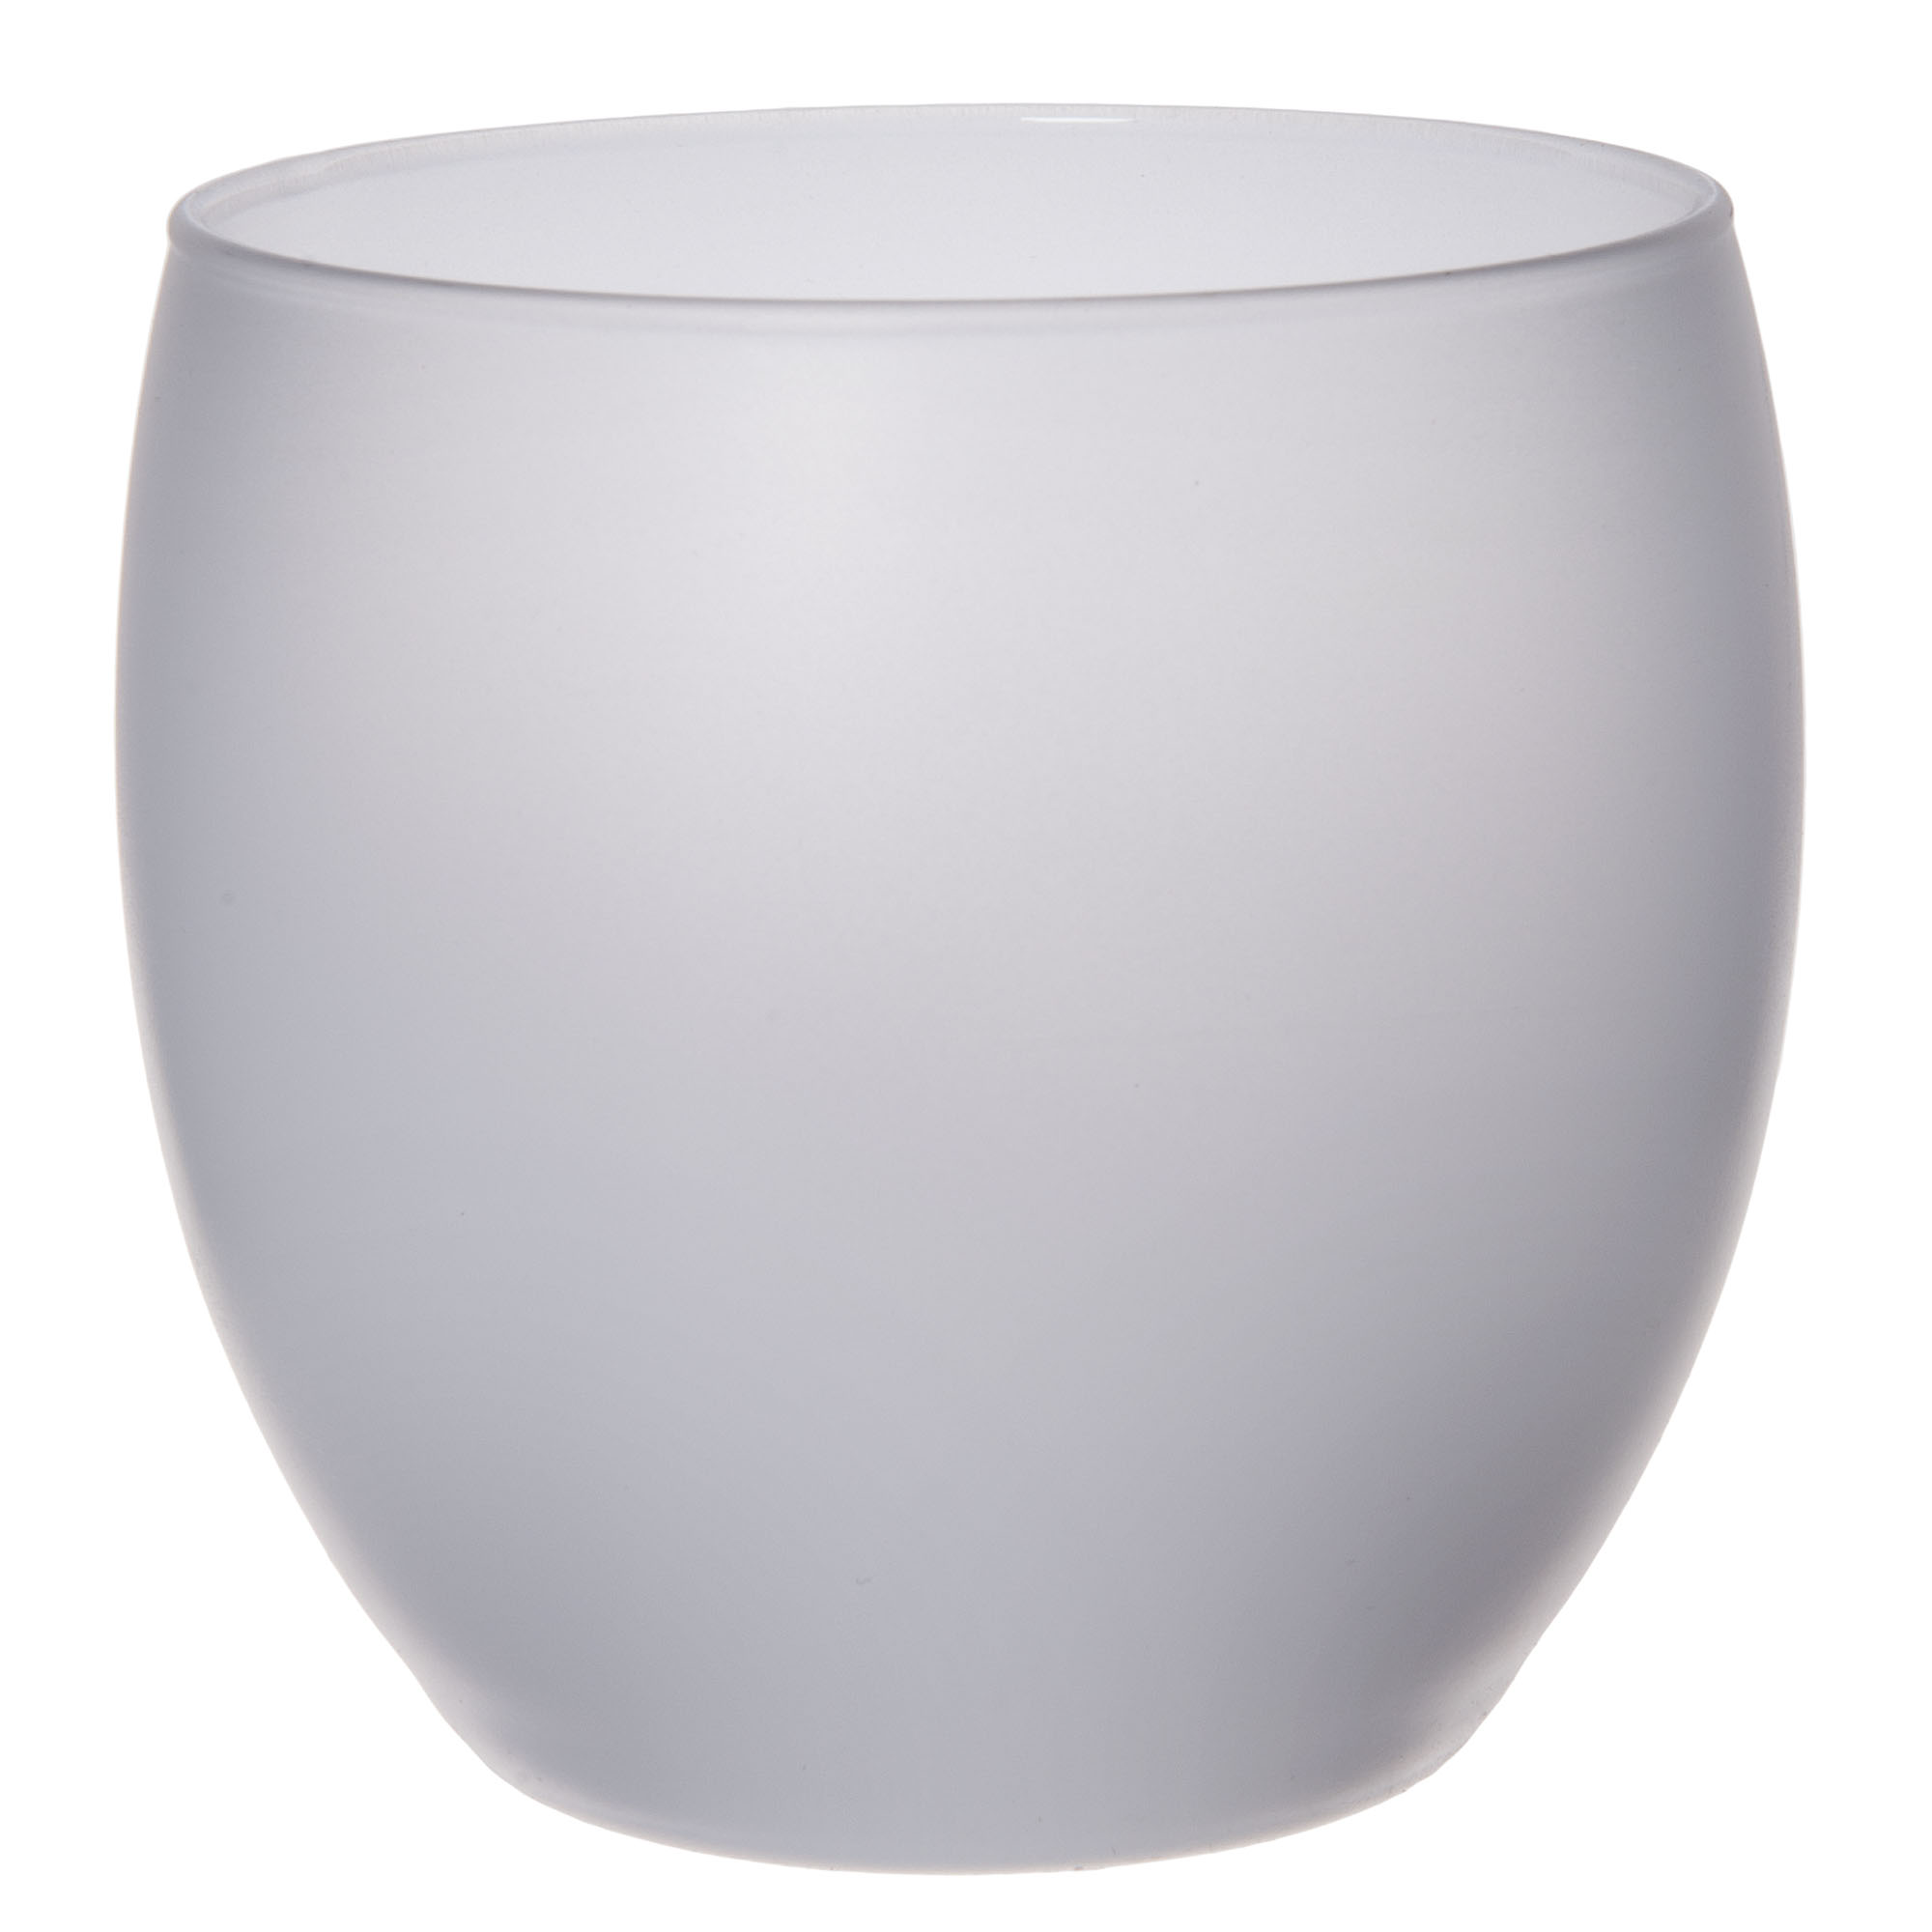 Стакан низкий 340 мл Frost White Luminarc стакан luminarc dallas lilac 300 мл